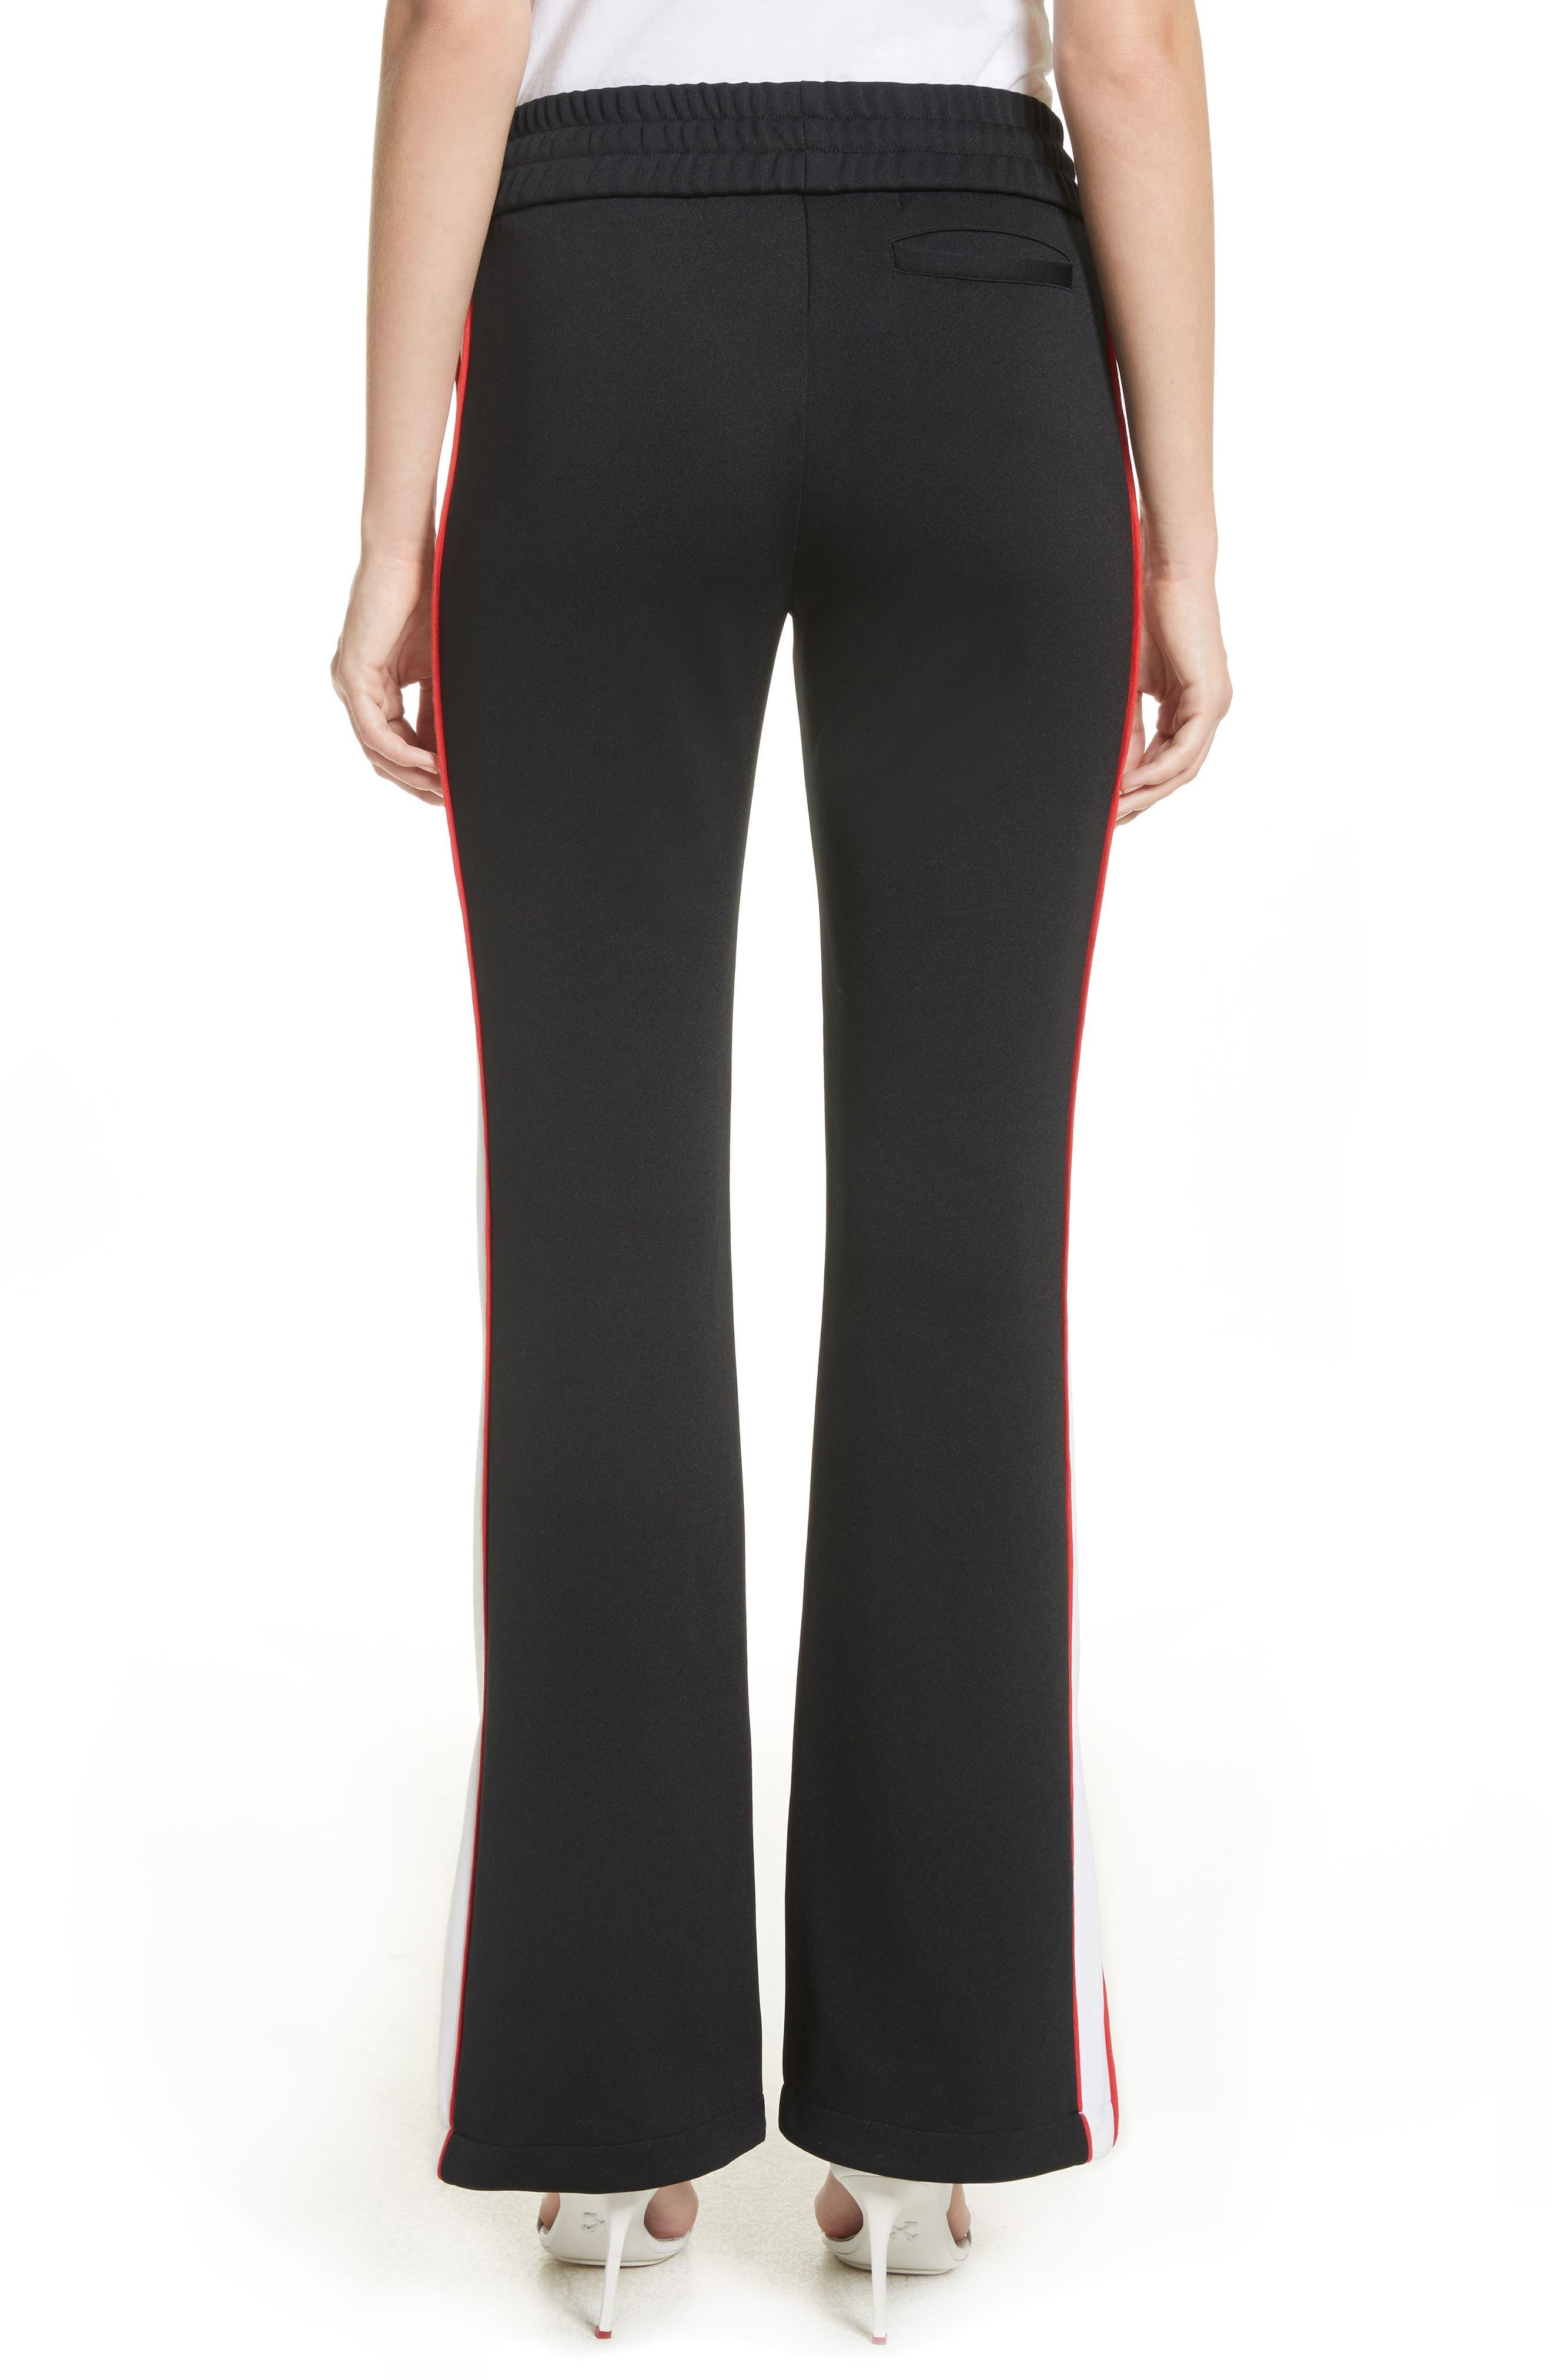 Flare Leg Track Pants,                             Alternate thumbnail 2, color,                             Black/ No Color